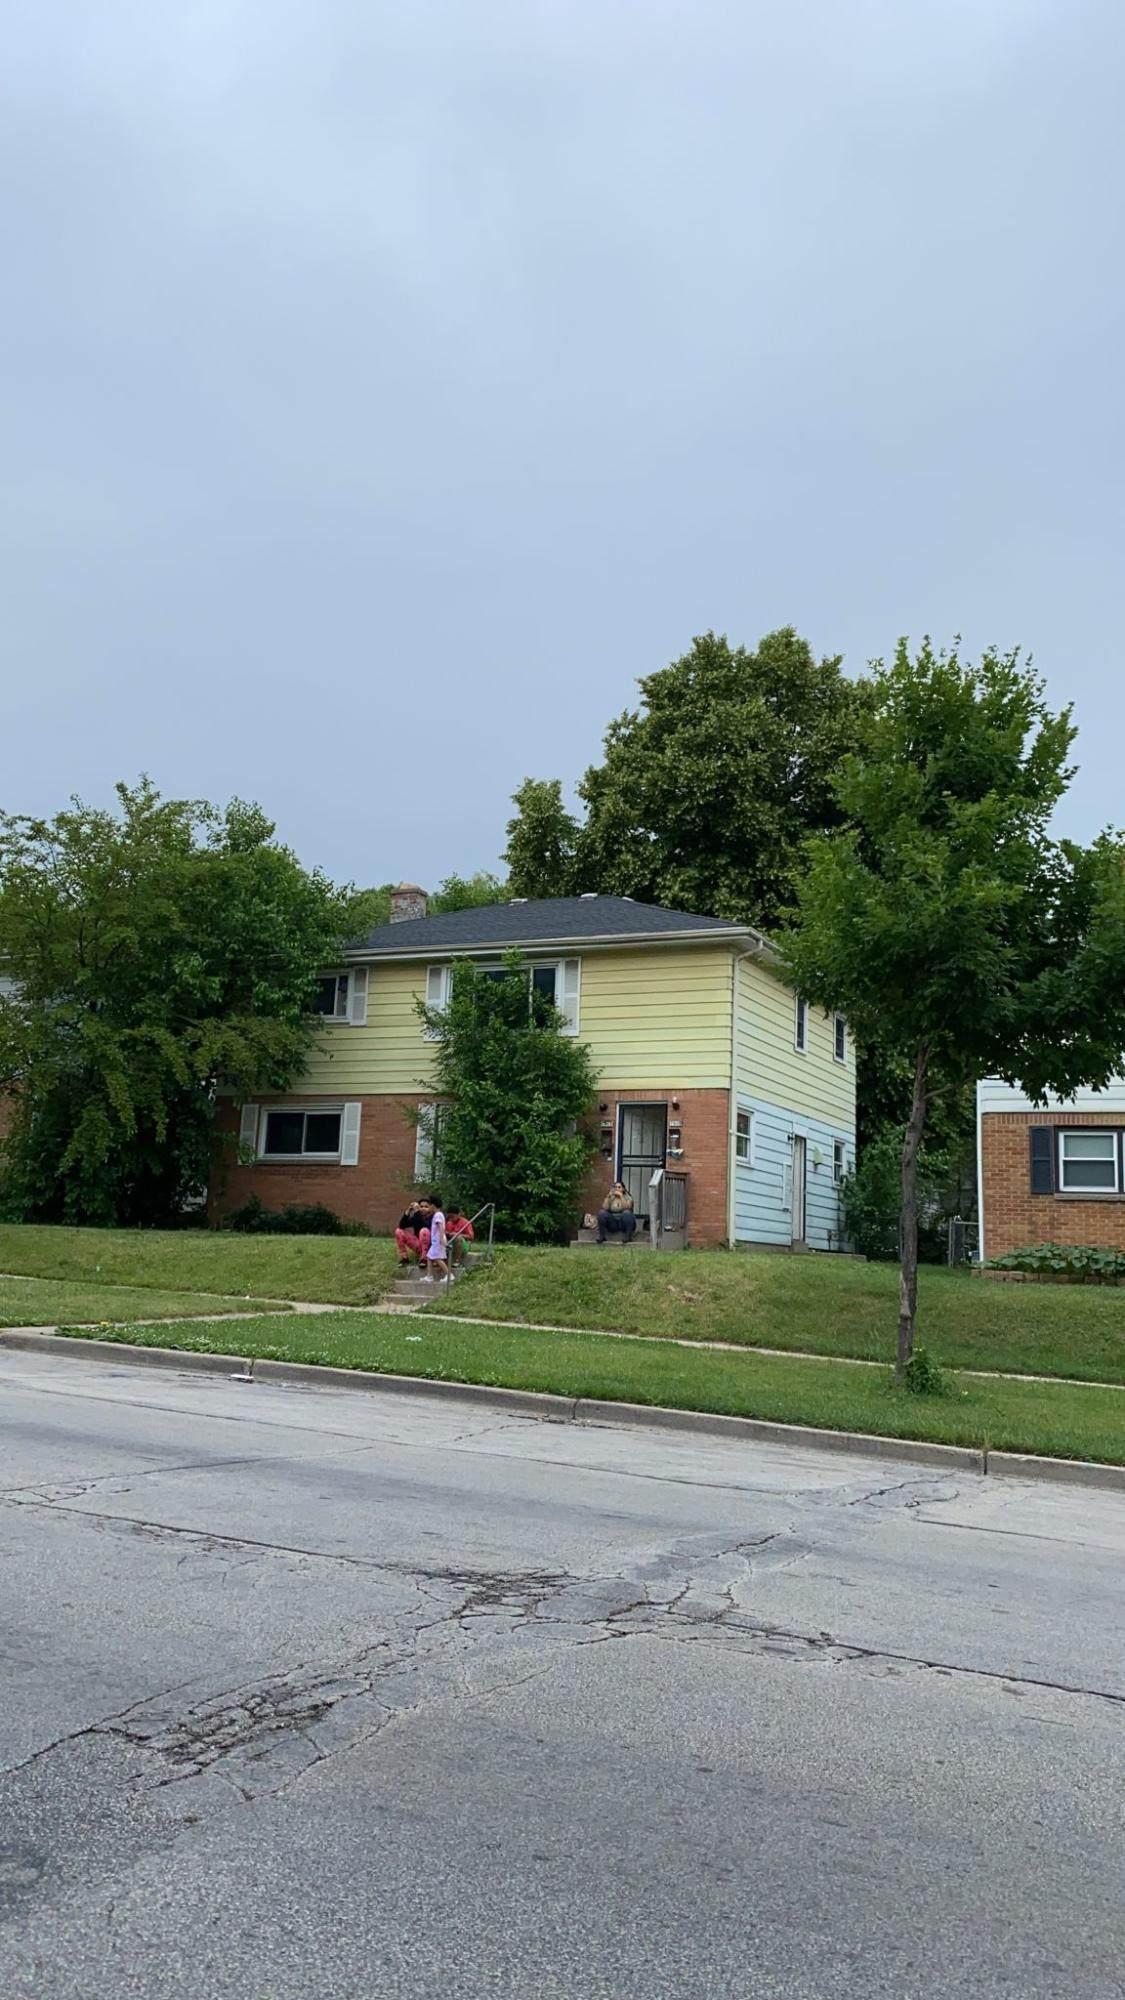 7908 Villard Ave - Photo 1